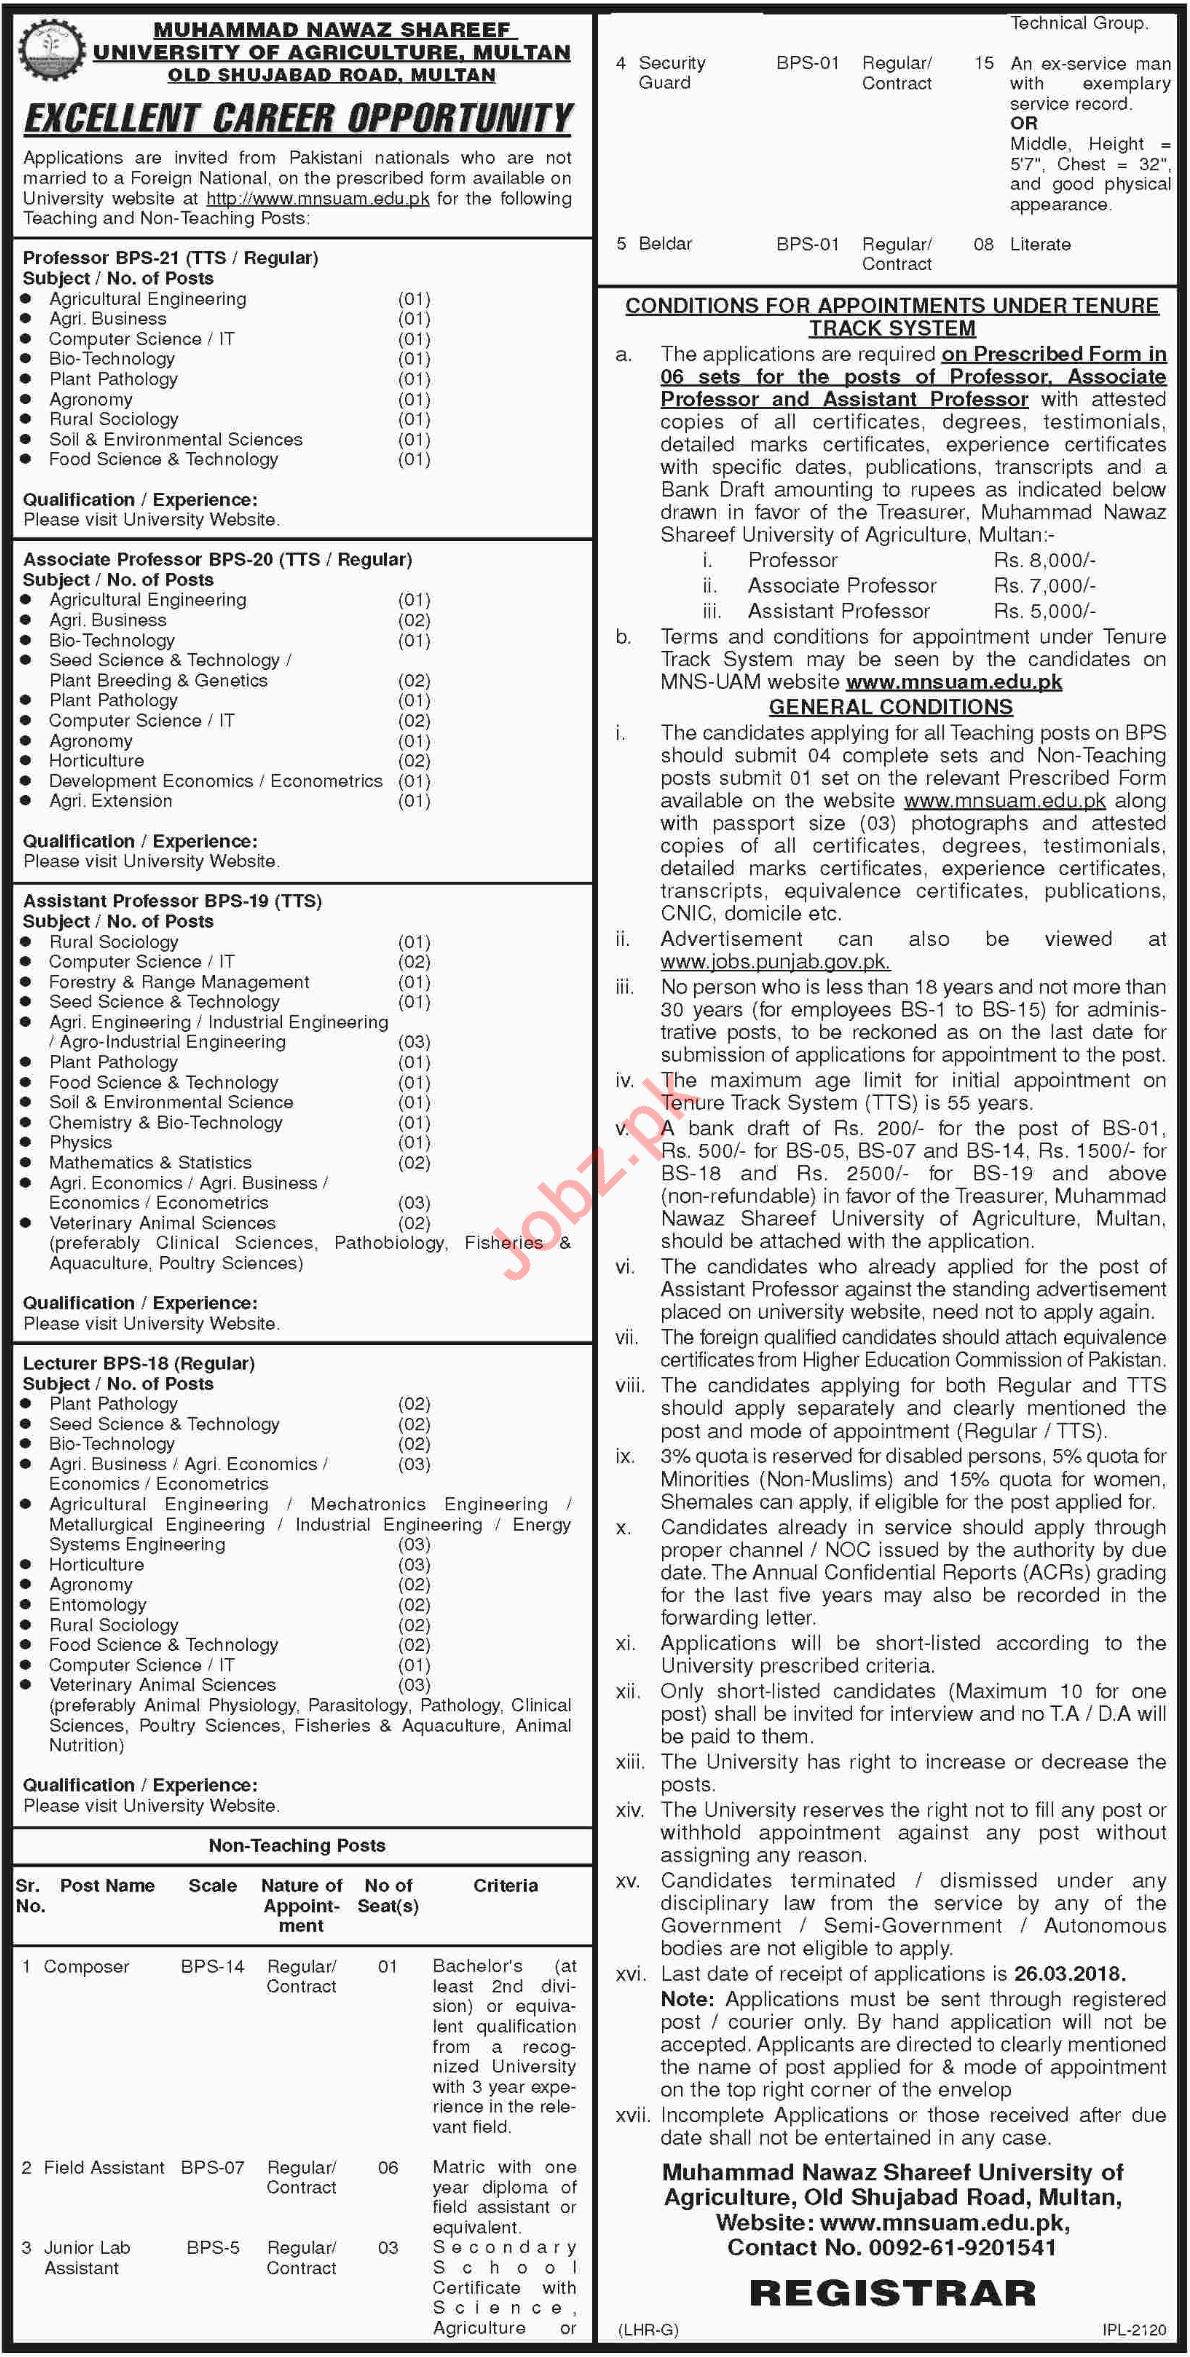 Muhammad Nawaz Shareef University of Agriculture Multan Jobs